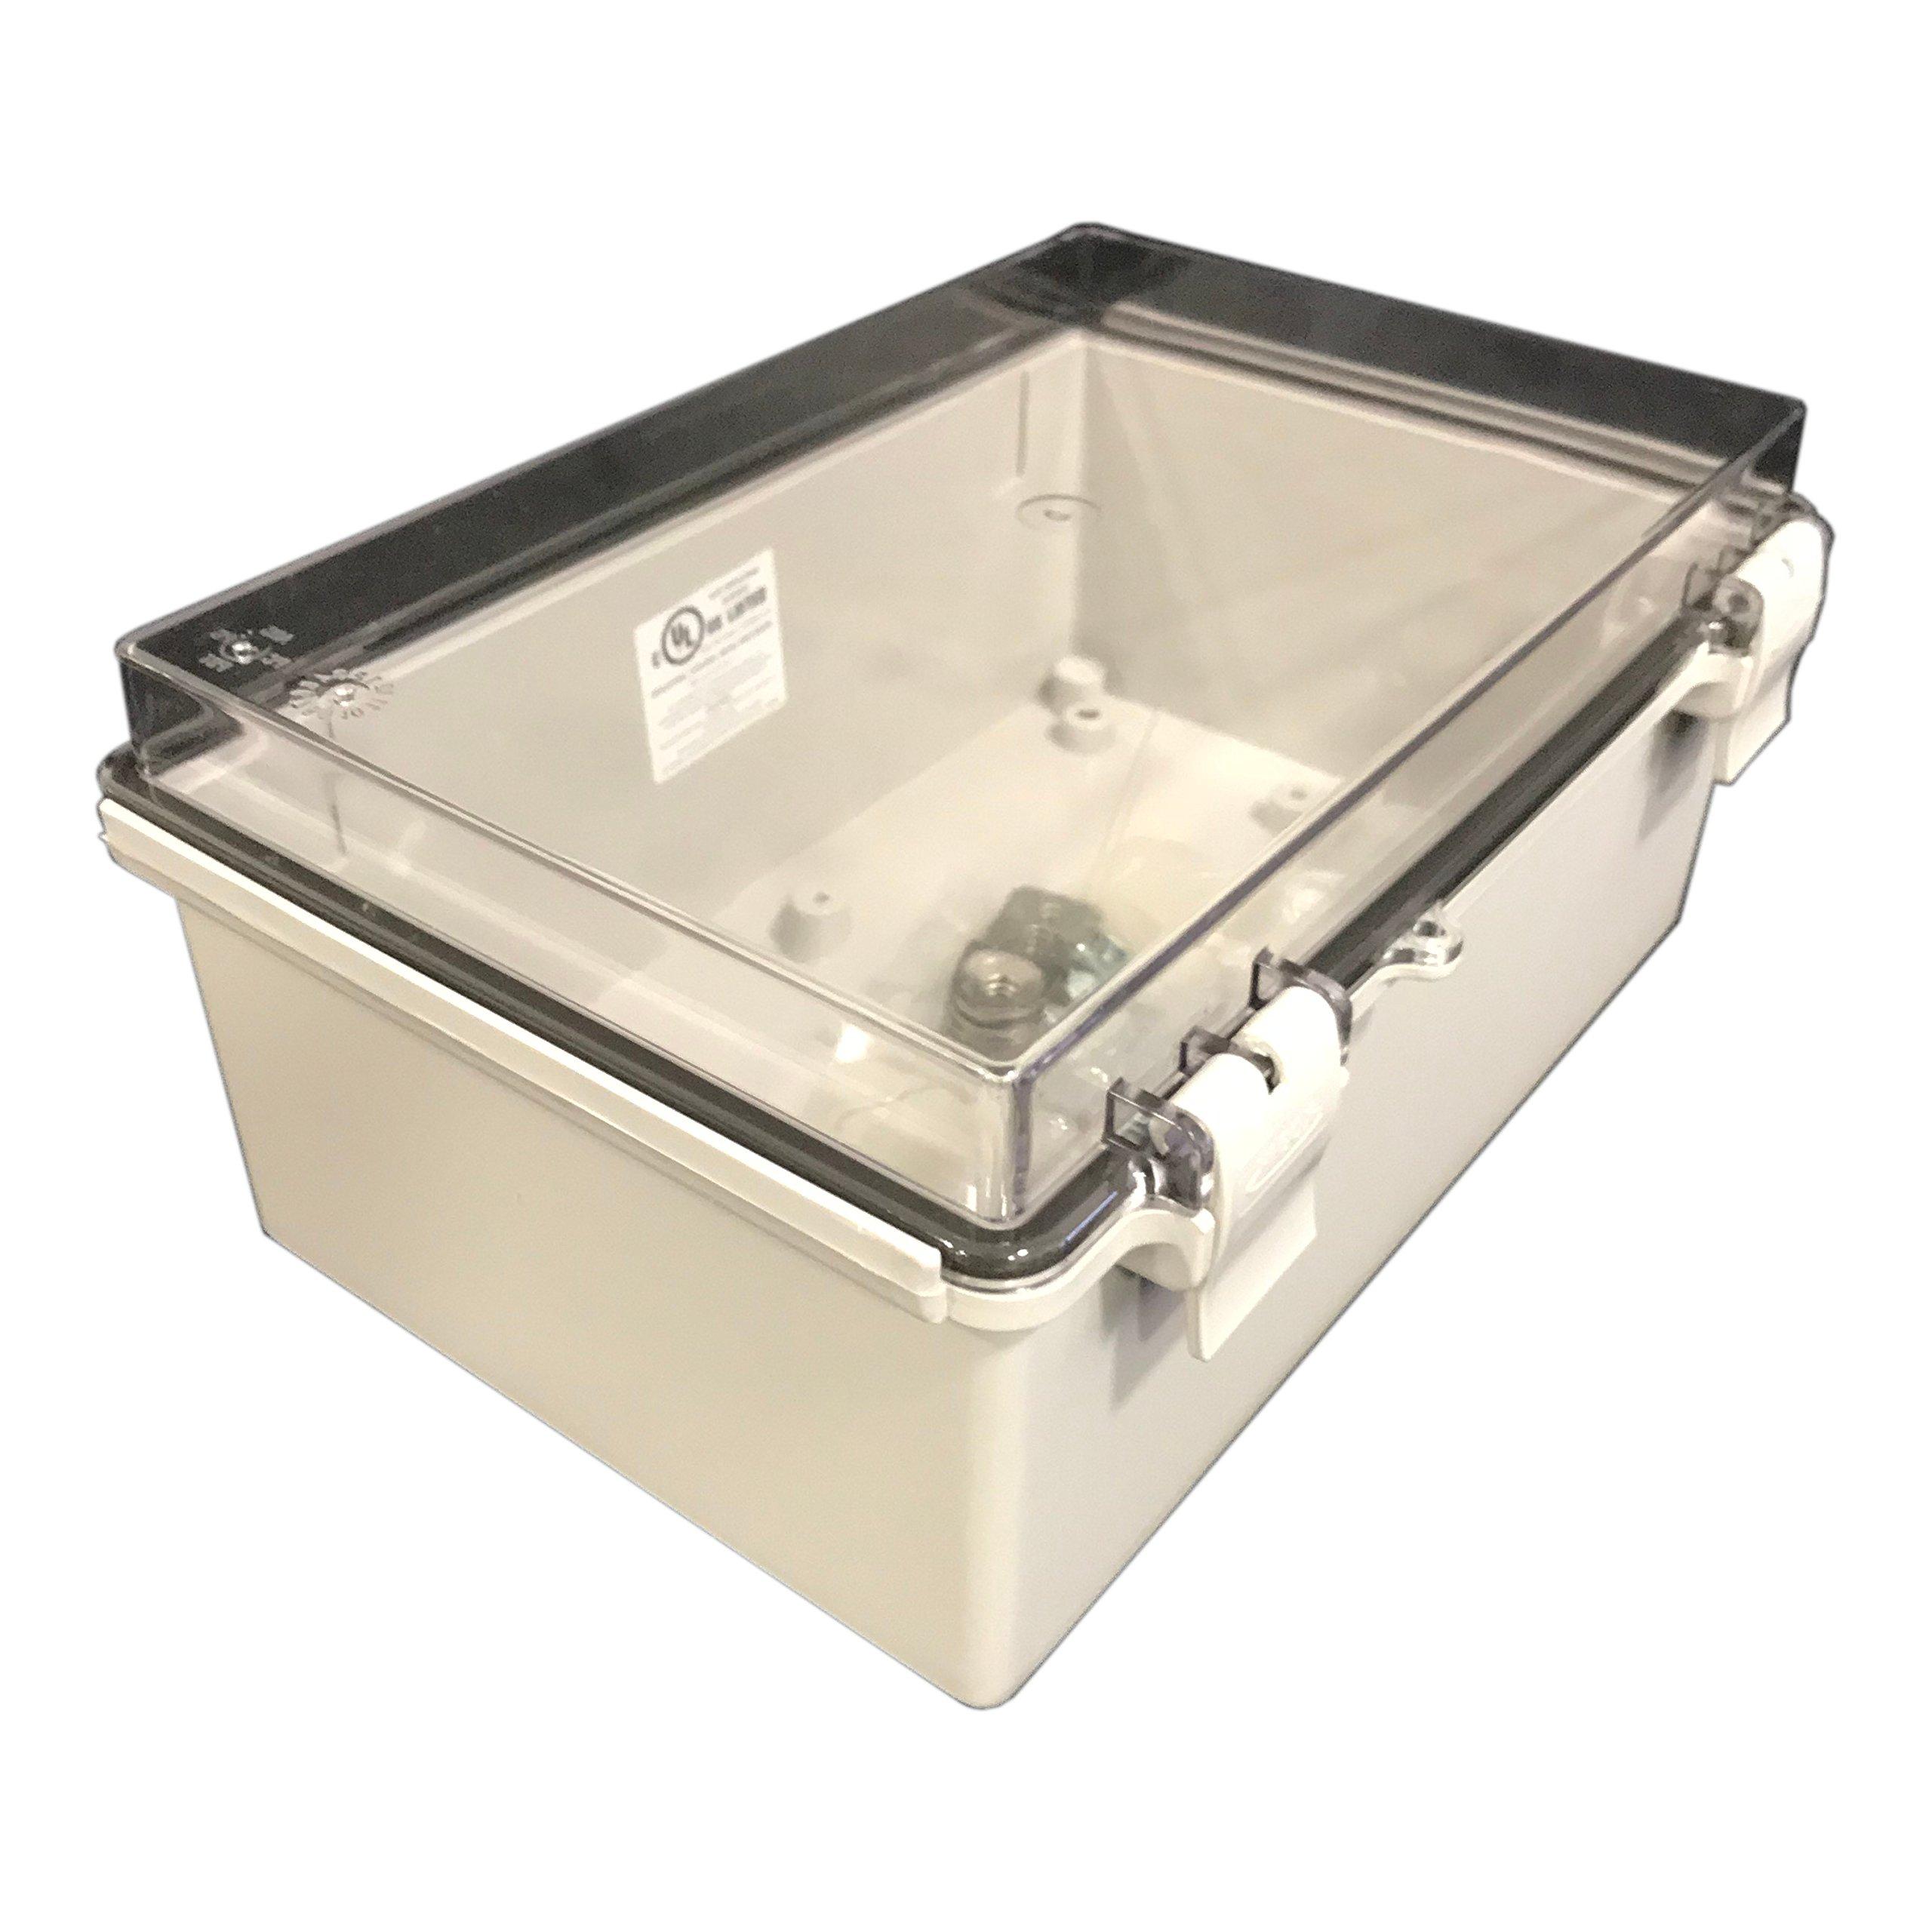 BUD Industries NBF-32416 Plastic Outdoor NEMA Economy Box with Clear Door, 11-51/64'' Length x 7-55/64'' Width x 5-7/64'' Height, Light Gray Finish